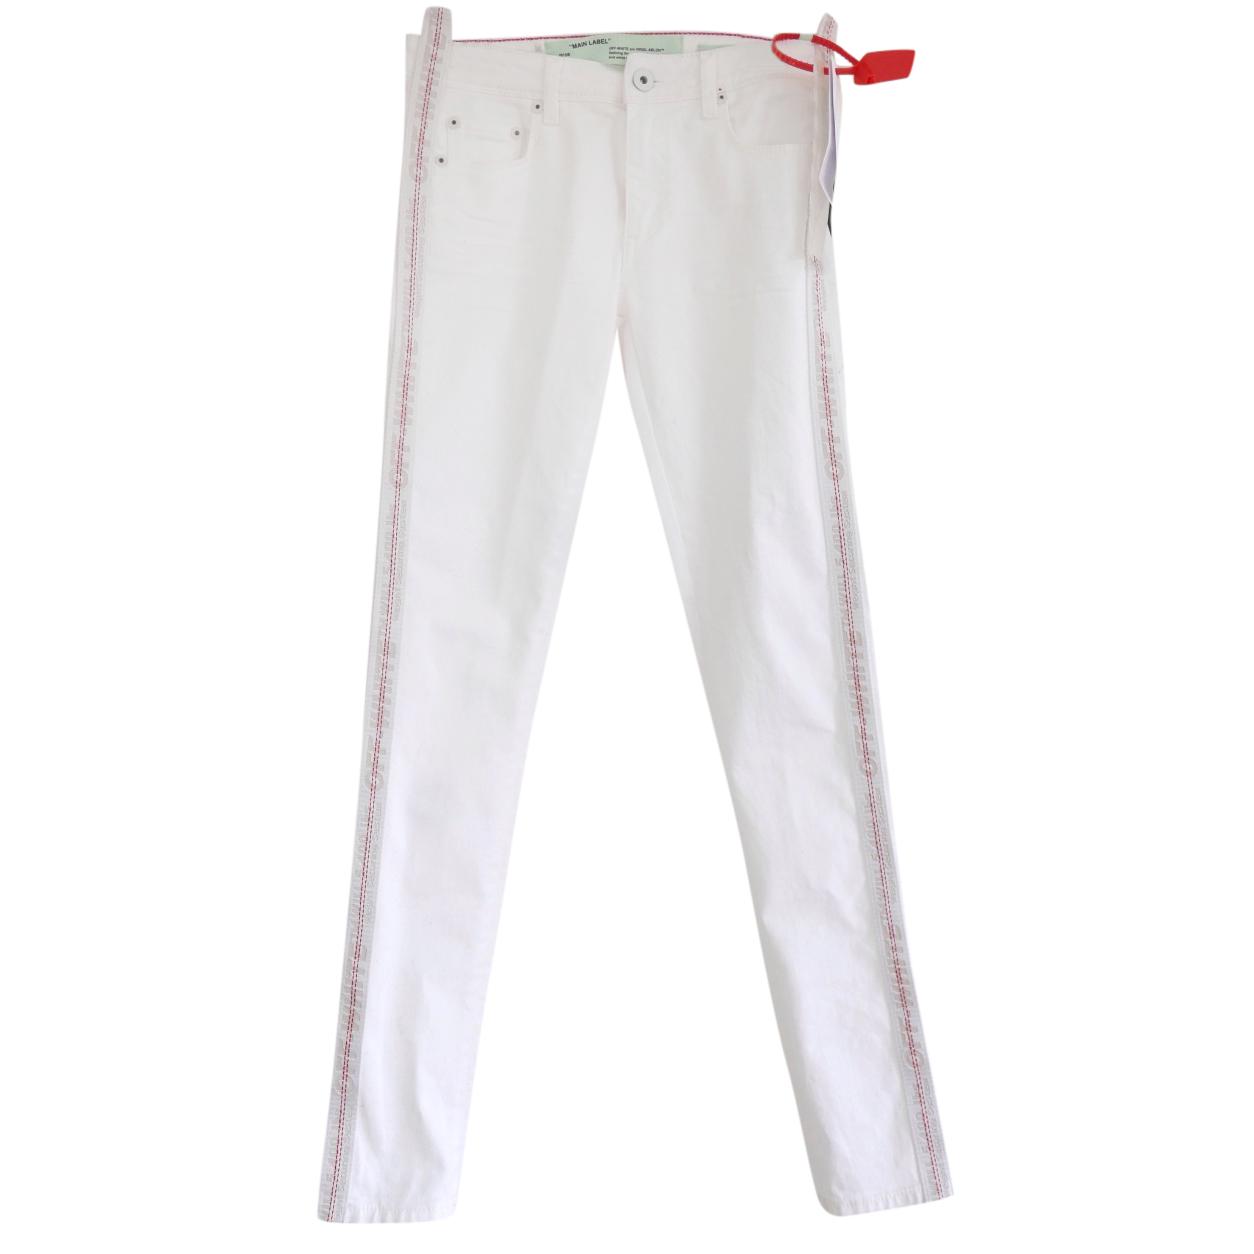 Off-White Industrial Belt Side White Denim Jeans